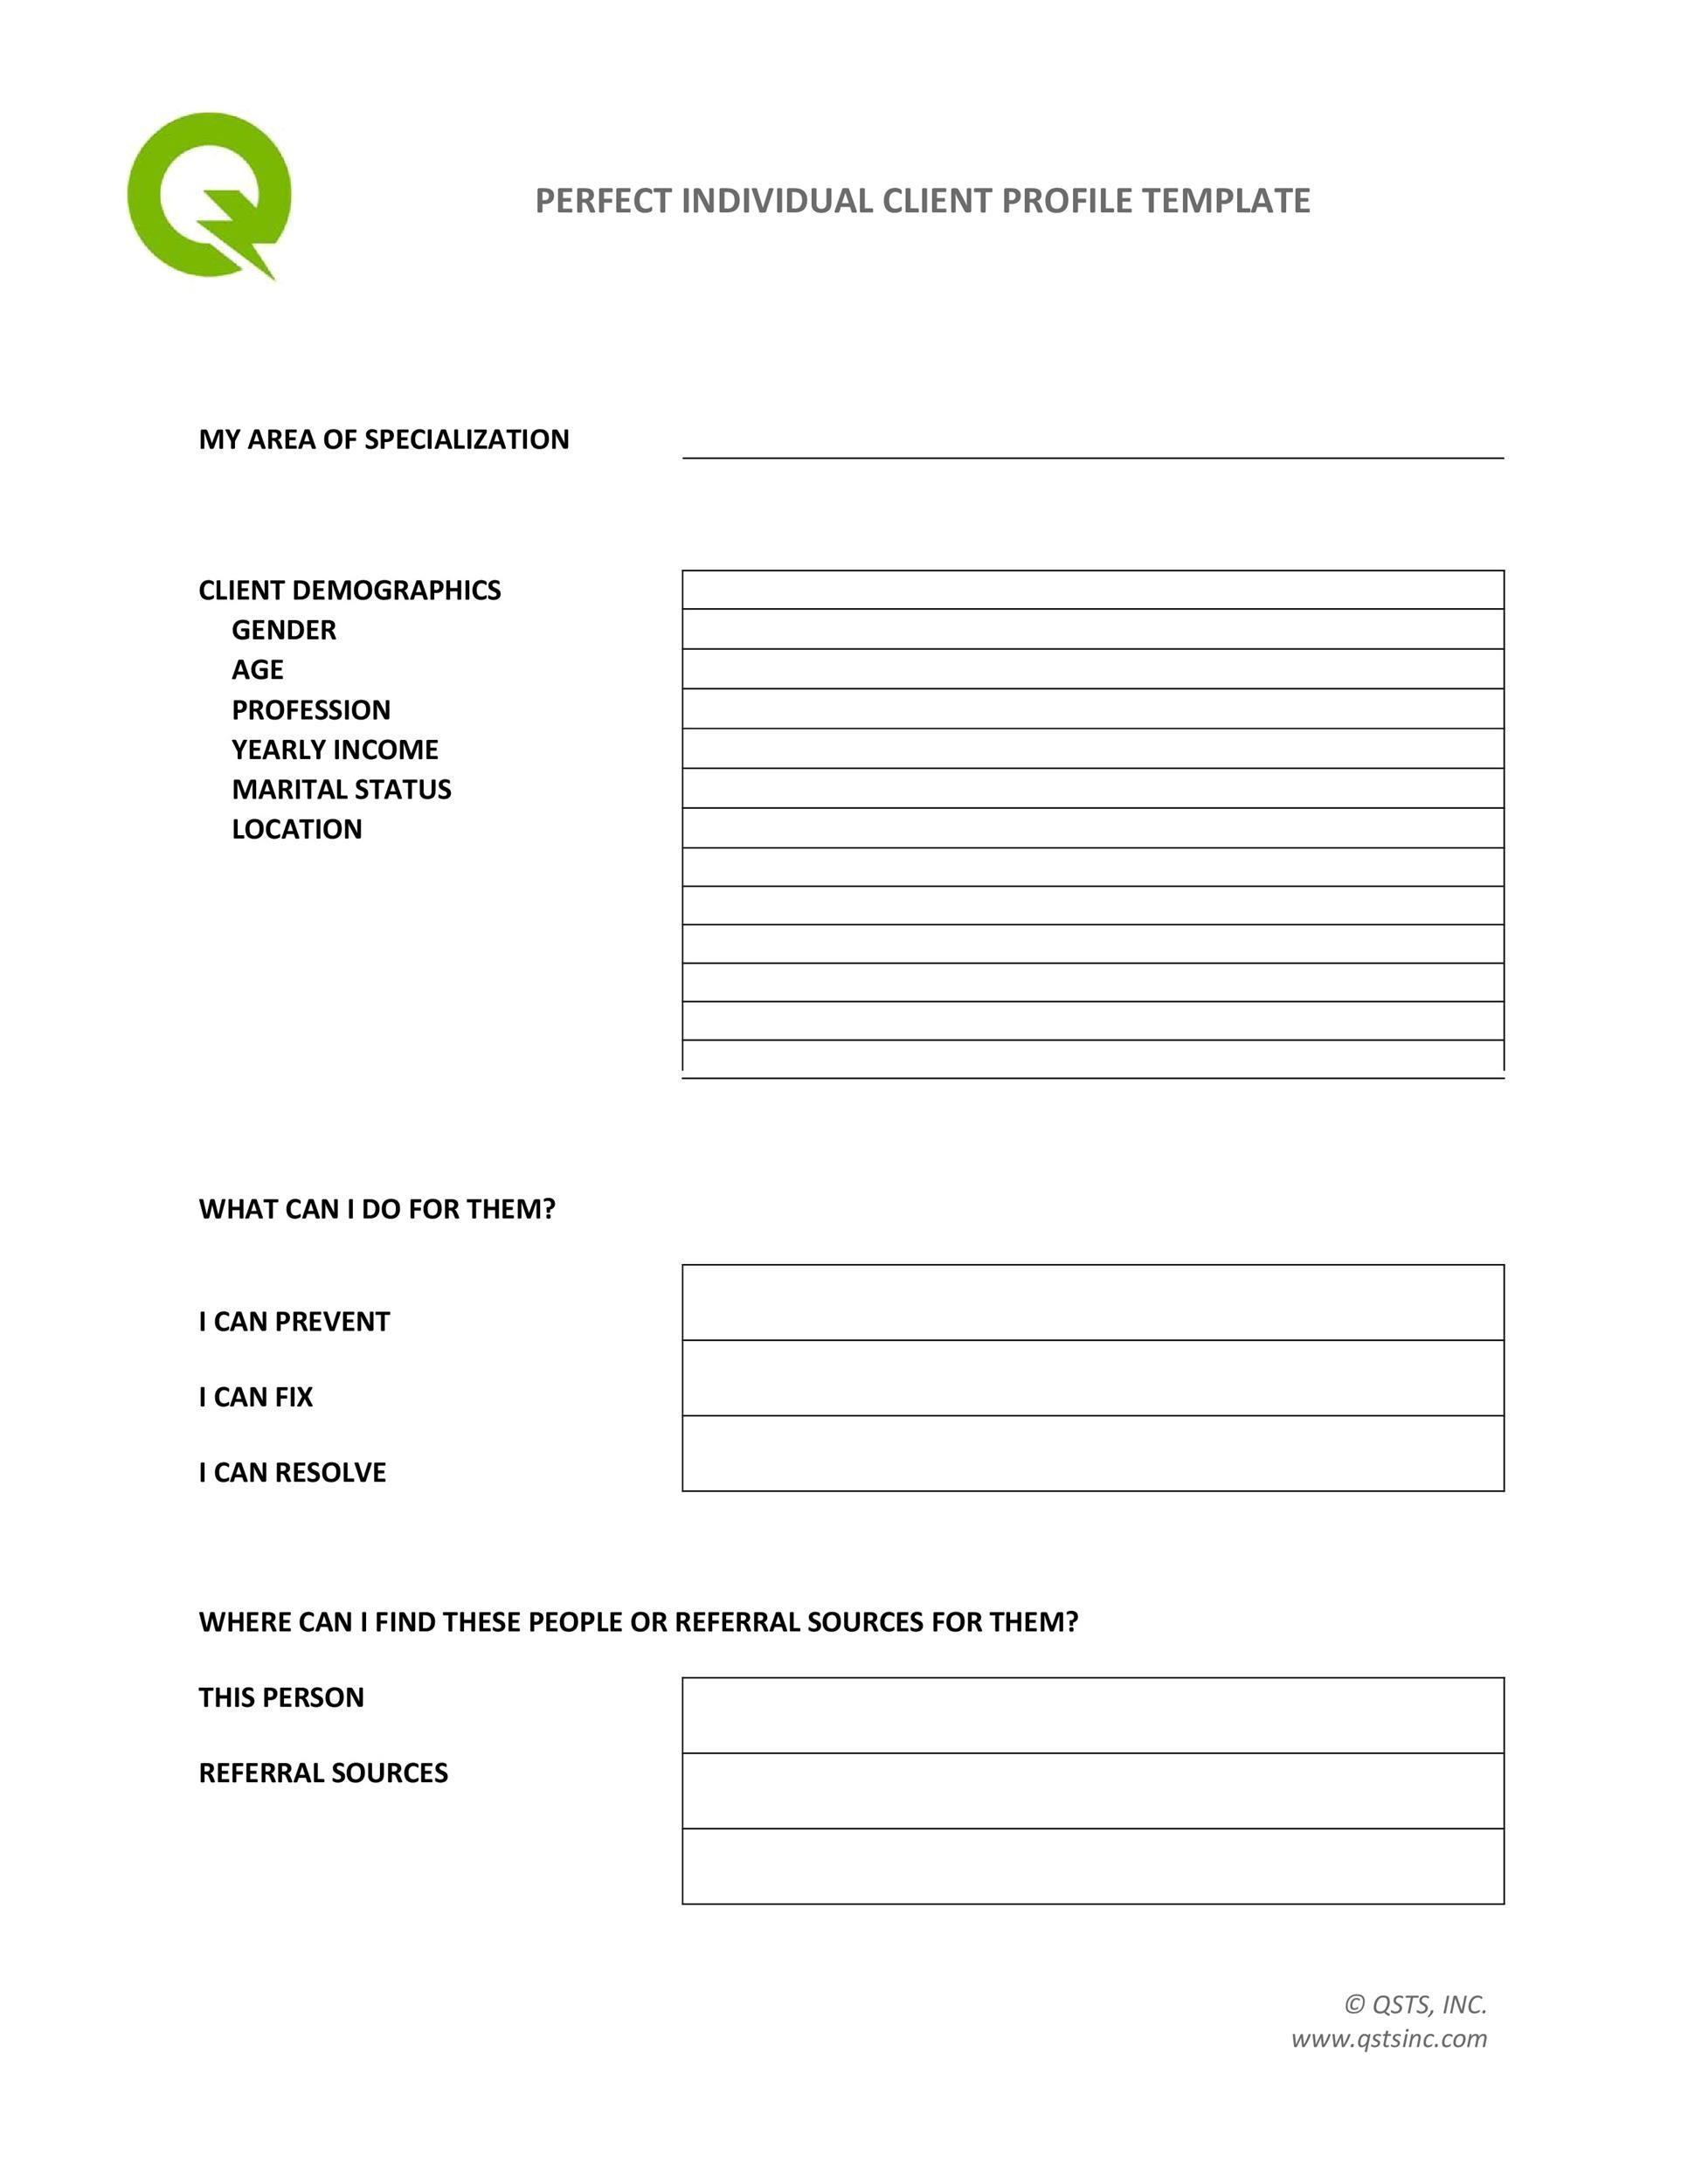 Free customer profile template 10